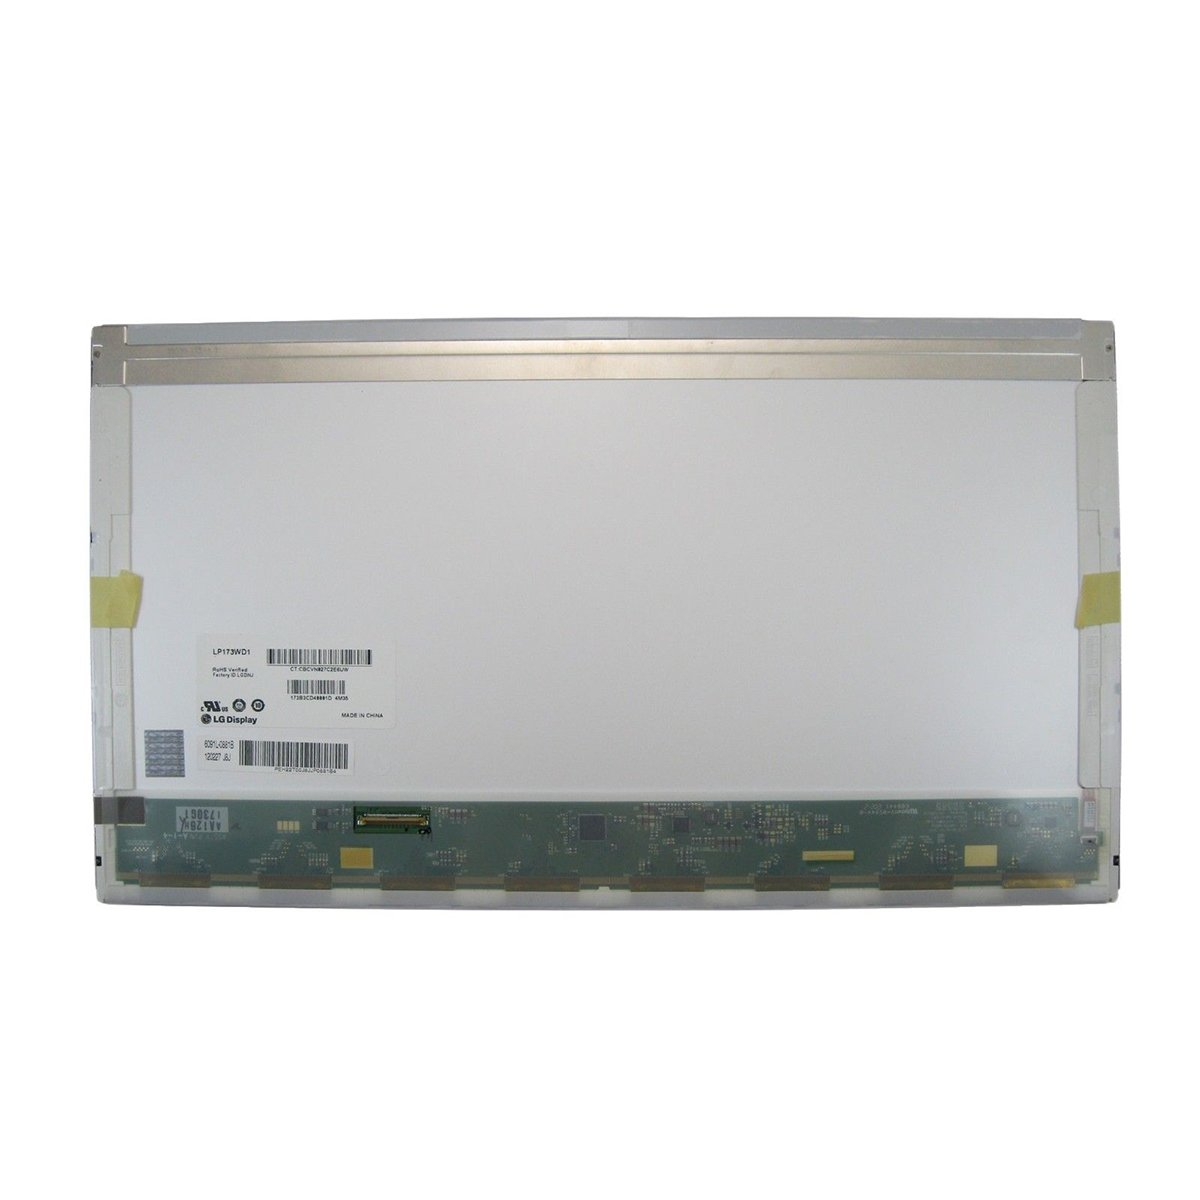 Pantalla AUO B173RW01 V.3 LCD Display 17.3 portatil HD+ 1600X900 TFT LED V3 T-CLA-2